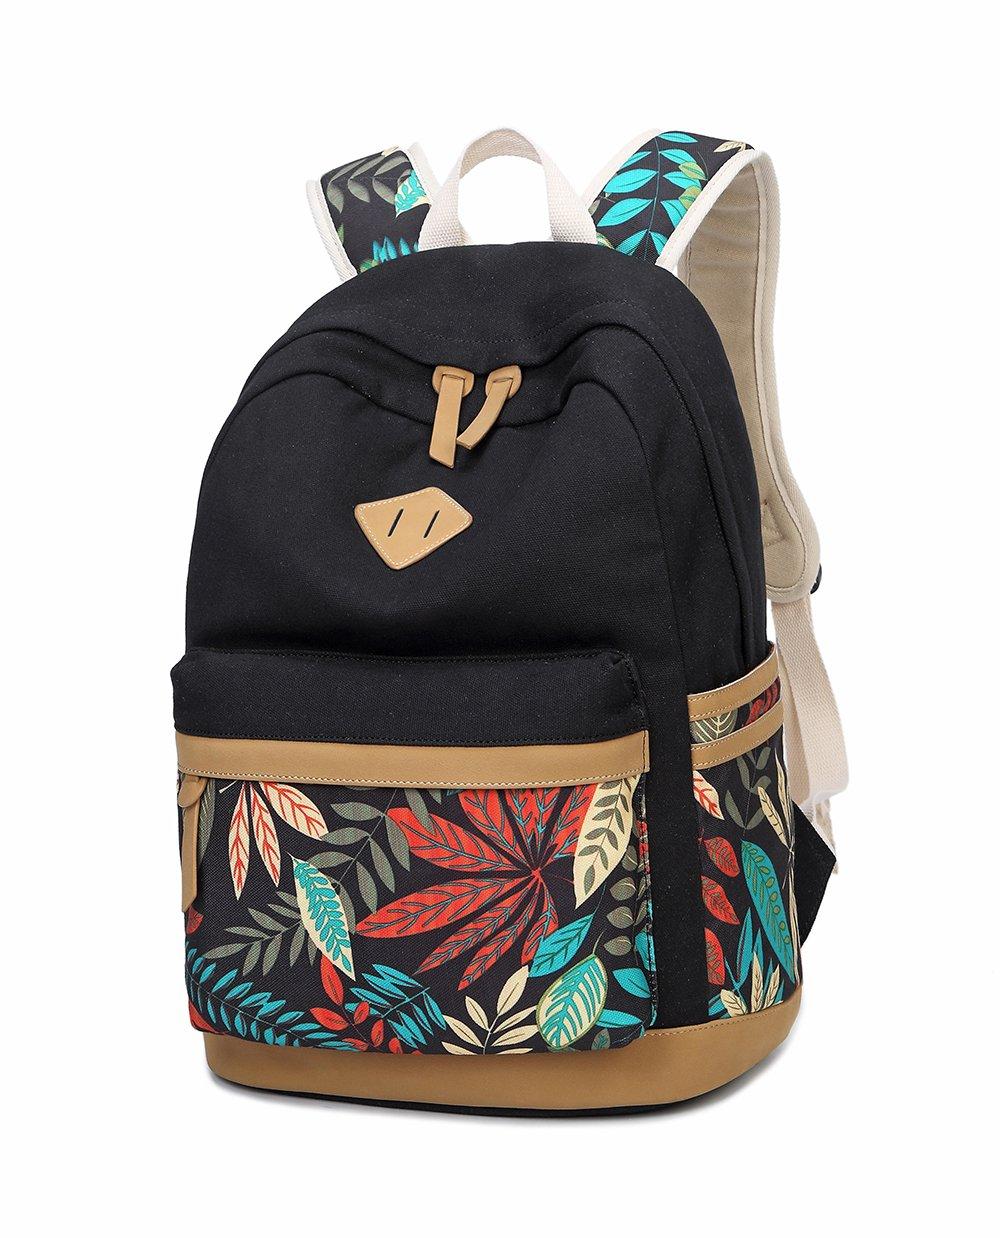 LuckyZ Women Girls Backpack Lightweight Canvas Leather Daykpack Laptop School Bag Cute Printng Travel Shoulder Bookbags Leaf Black